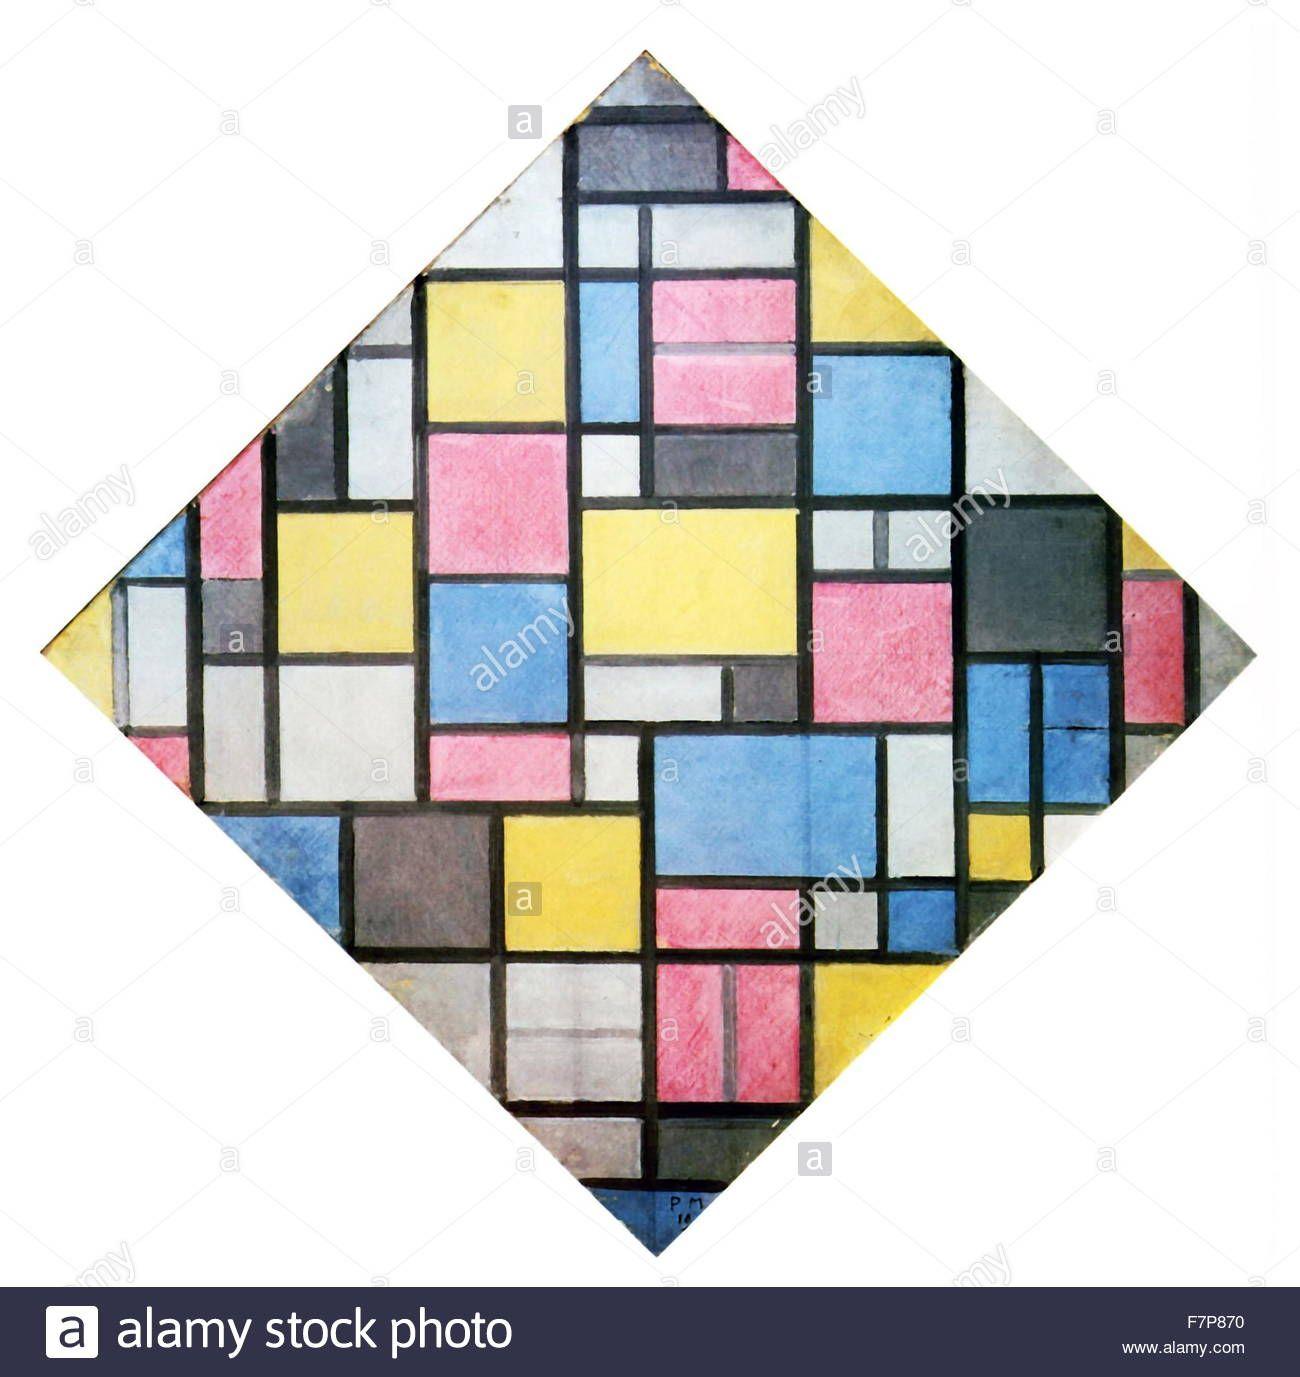 Related image Piet mondrian, Mondrian, Mondrian art